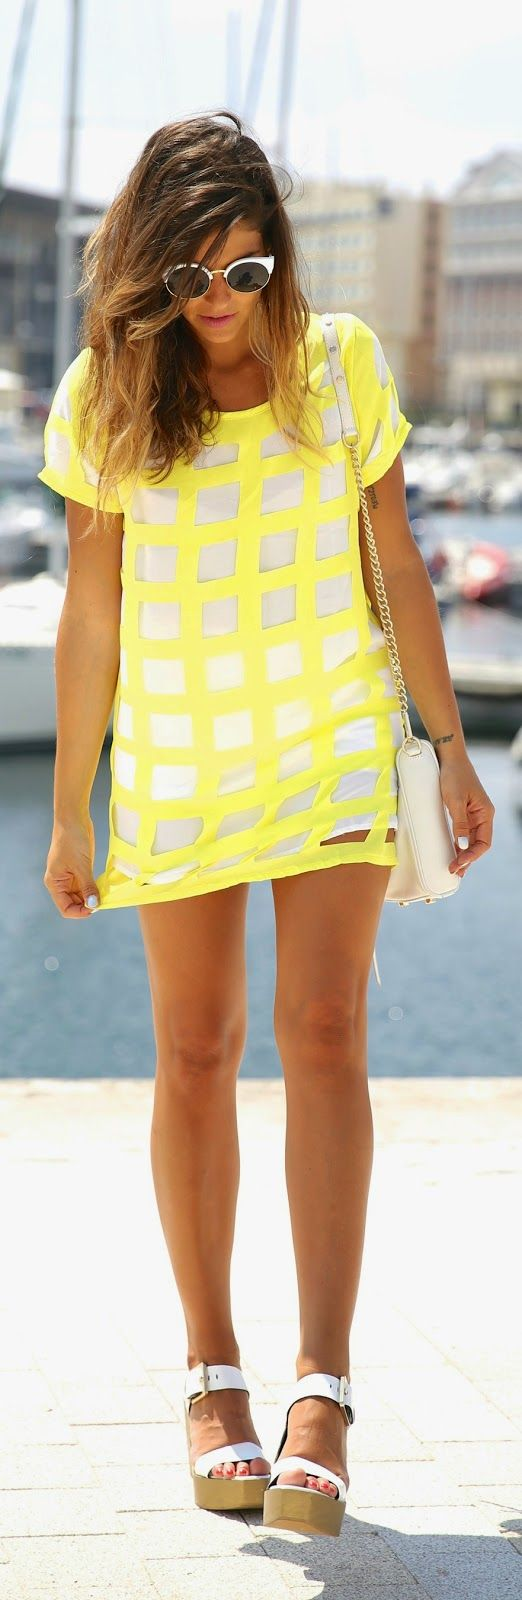 White + yellow.